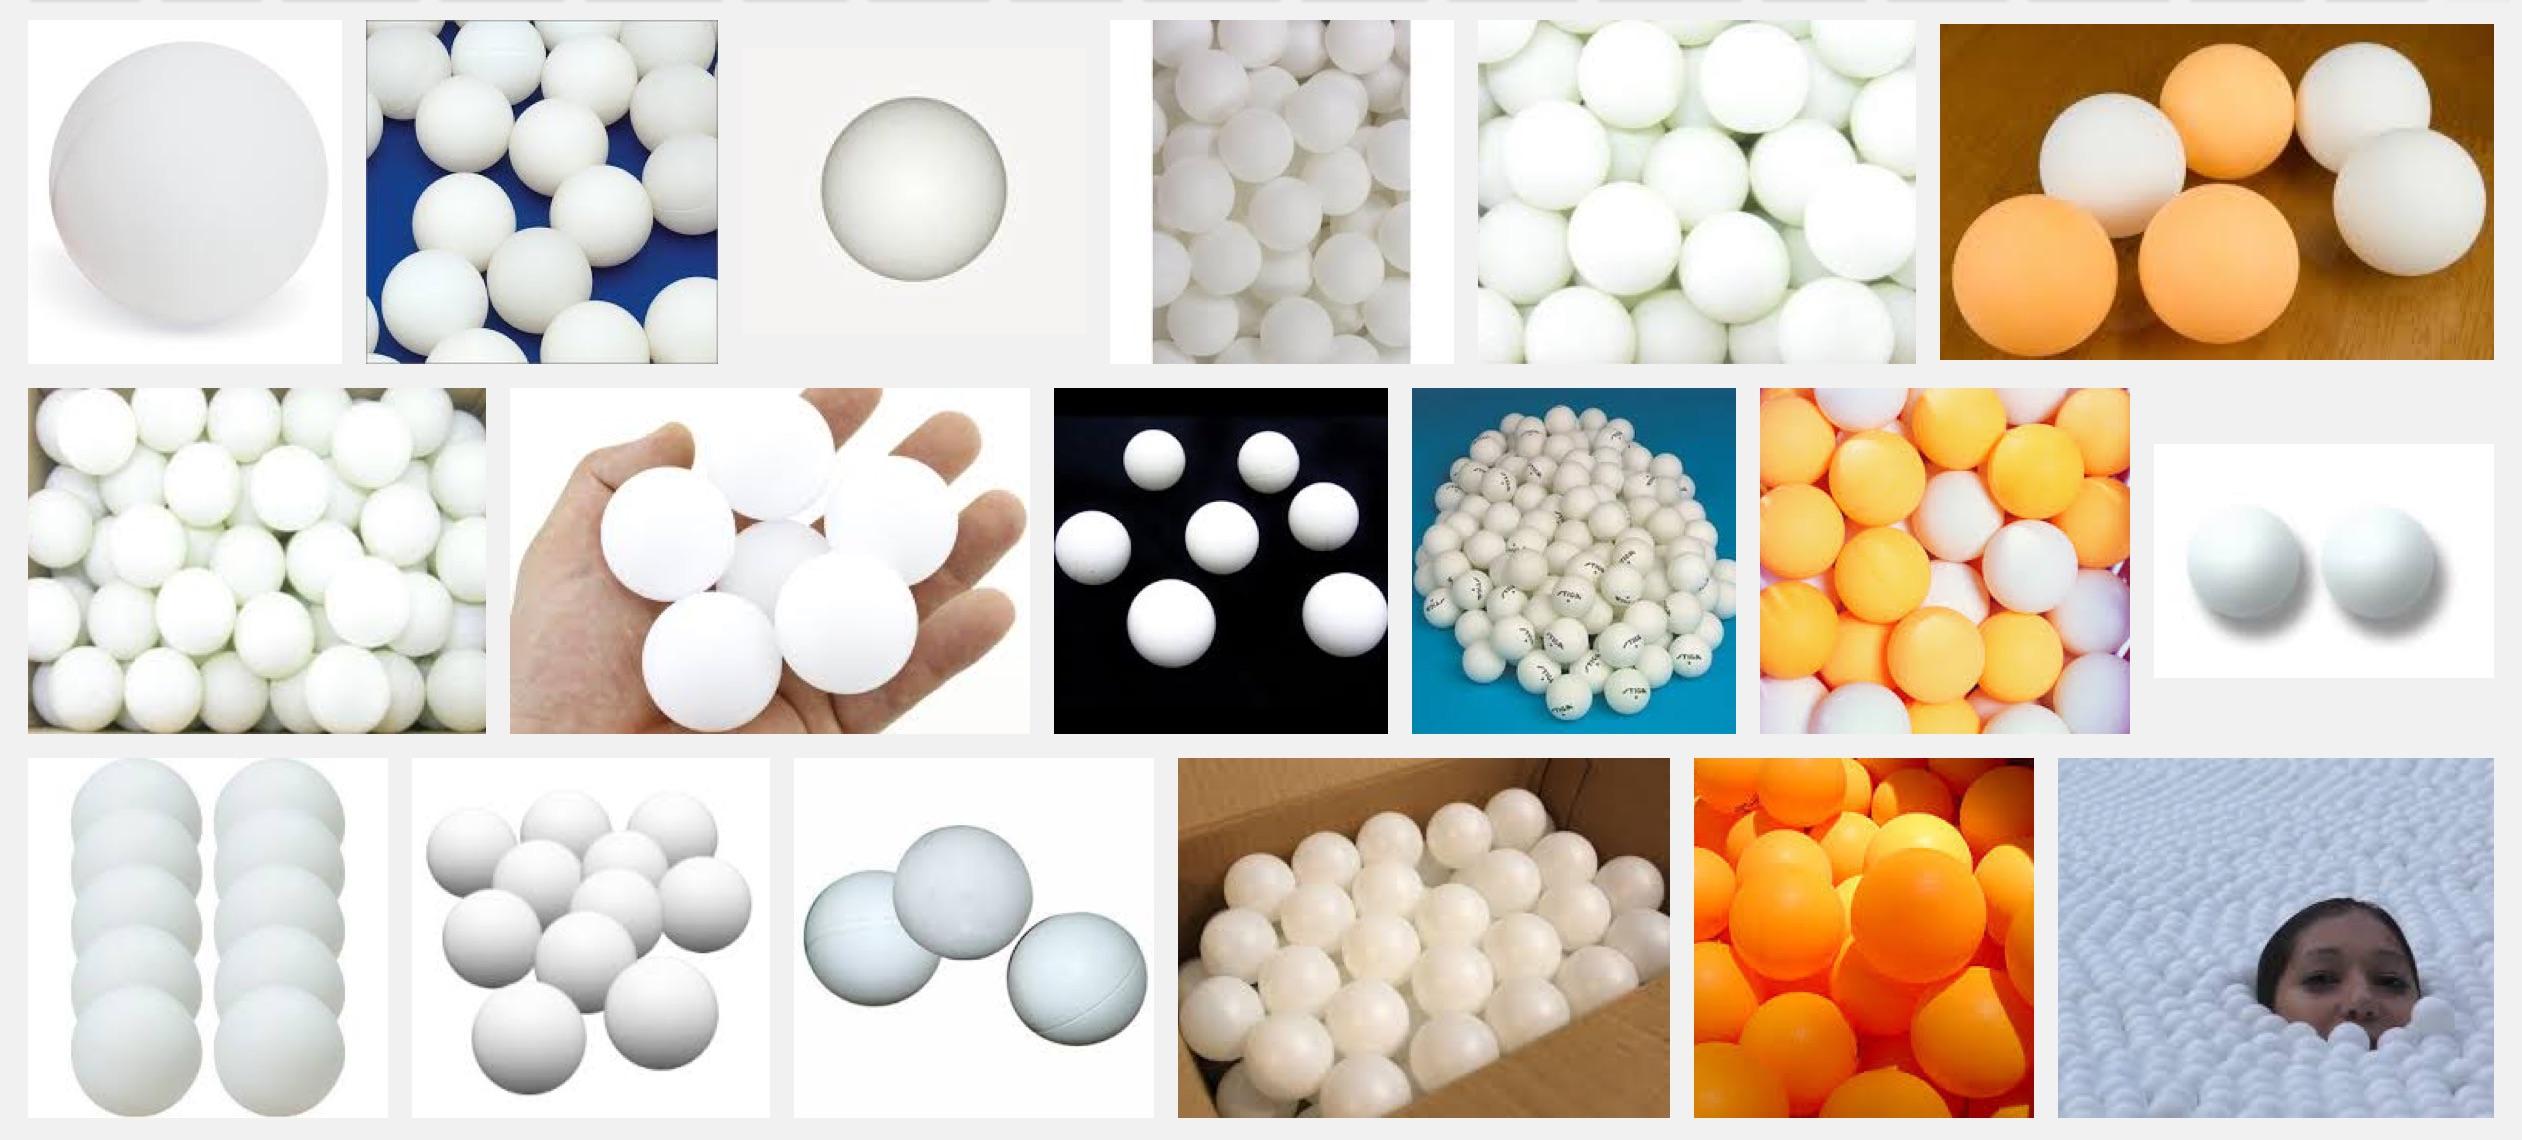 Google-search-ping-pong-balls